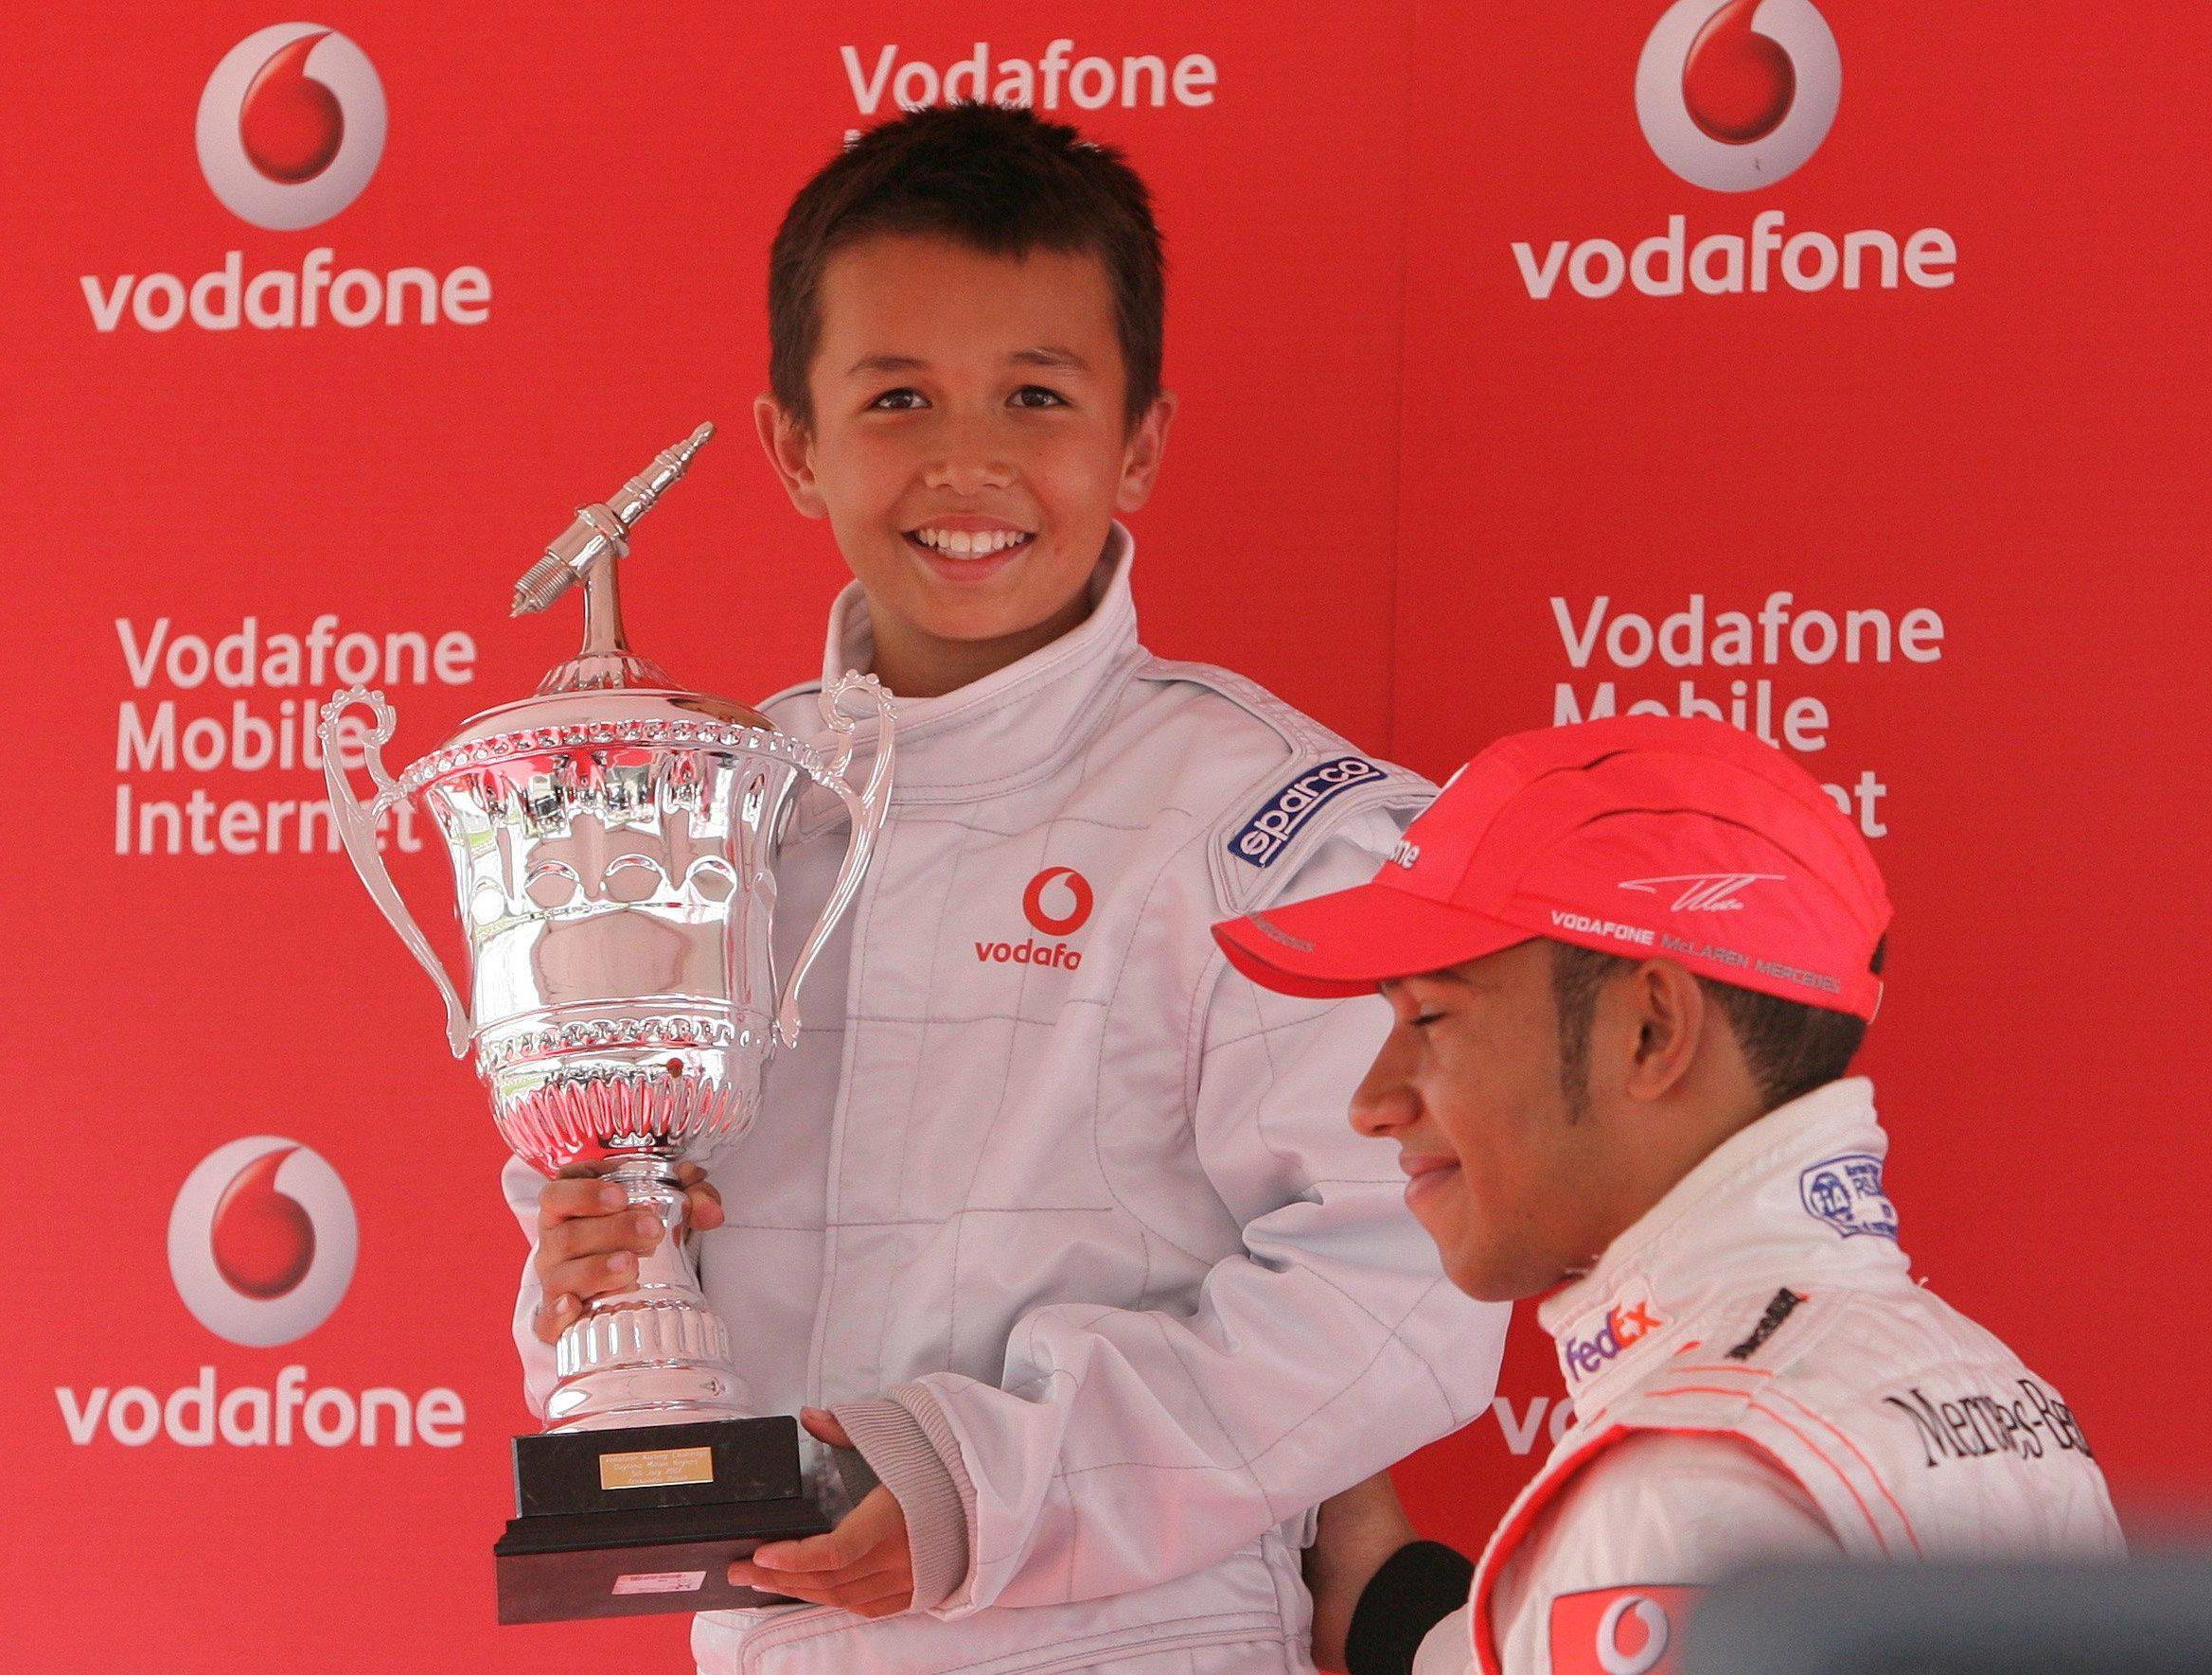 Alexander Albon alongside Lewis Hamilton in 2007